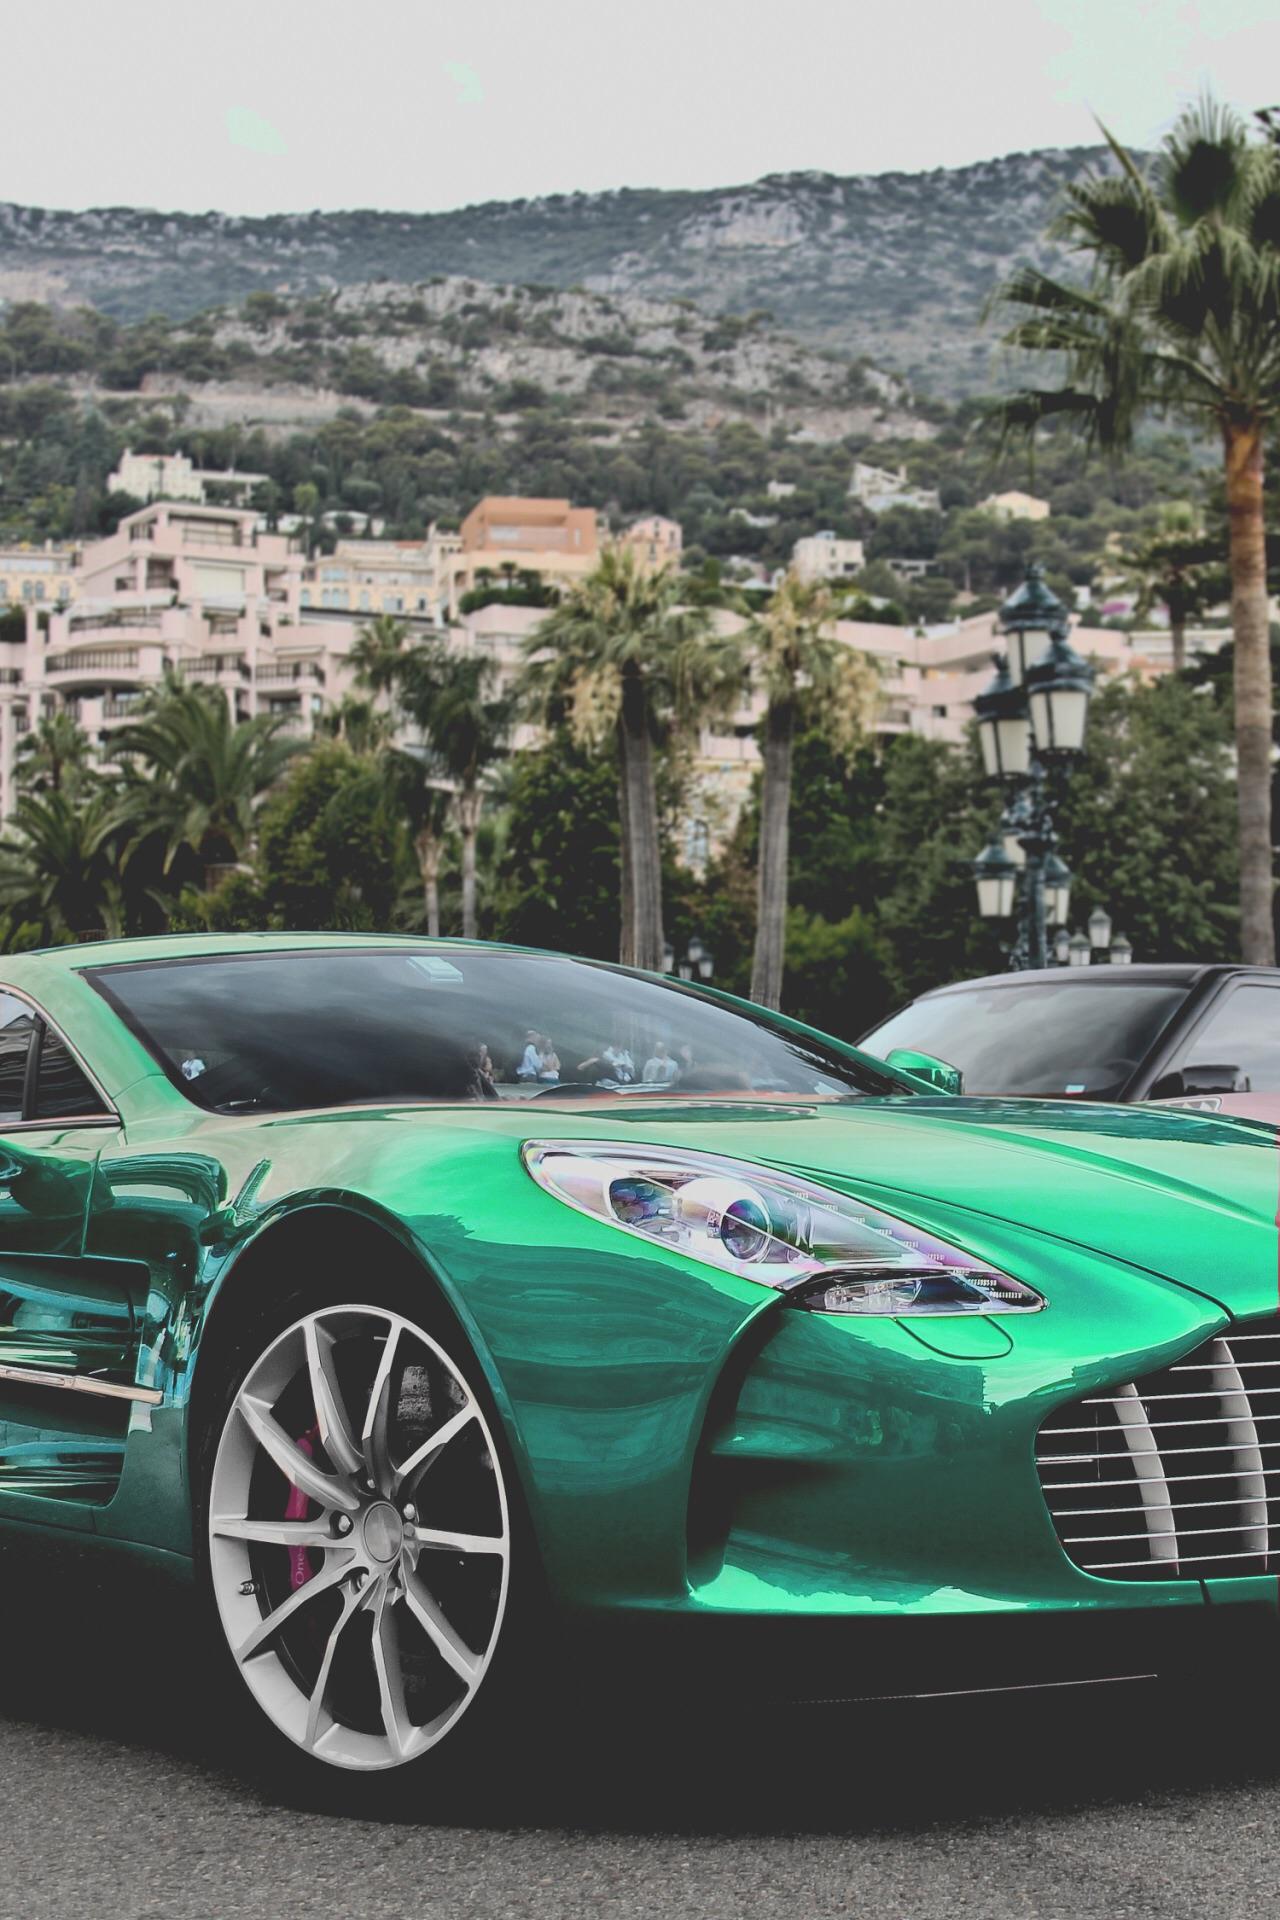 Visit-The-MACHINE-Shop-Café-The-Best-of-Aston-Martin-Emerald-Green-Aston-Martin-wallpaper-wp58010518